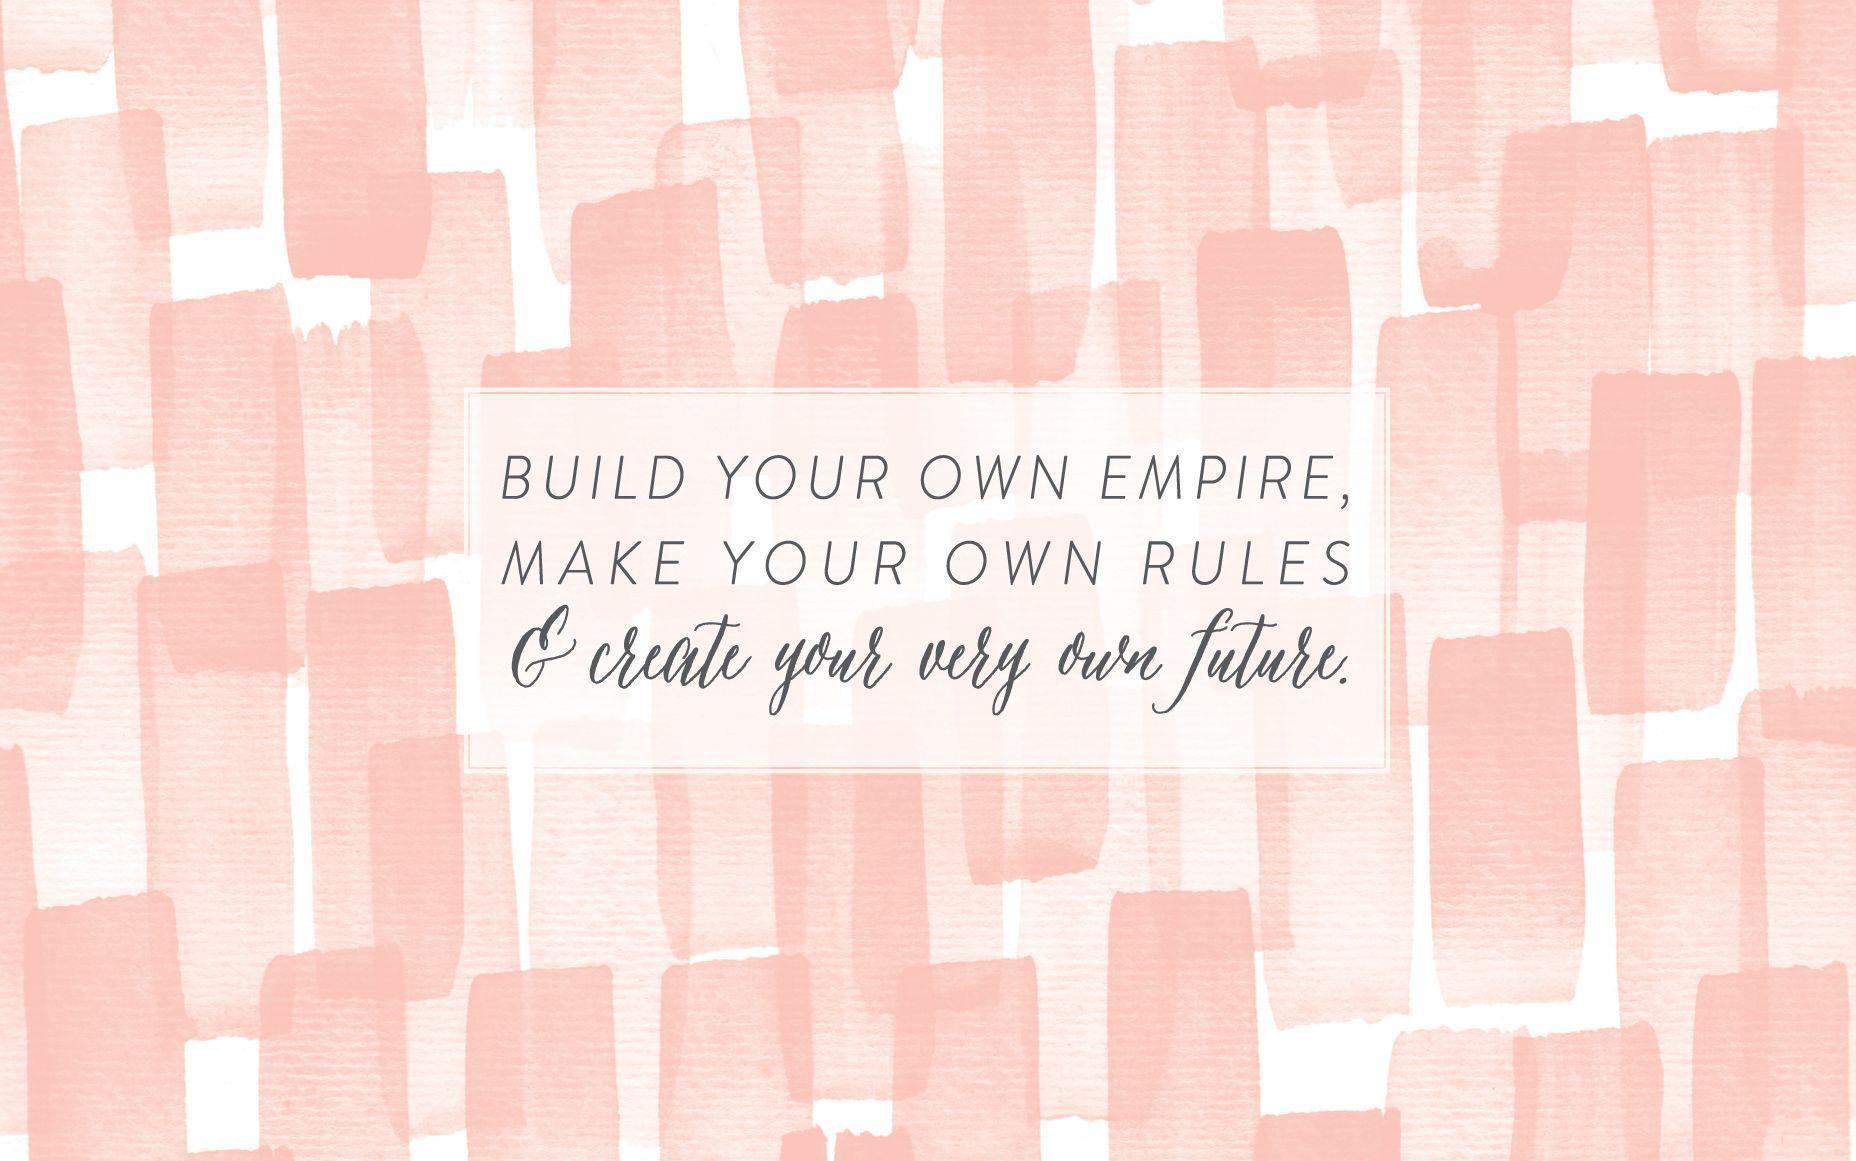 Mac Pastel Quotes Wallpapers   Top Mac Pastel Quotes 1856x1161